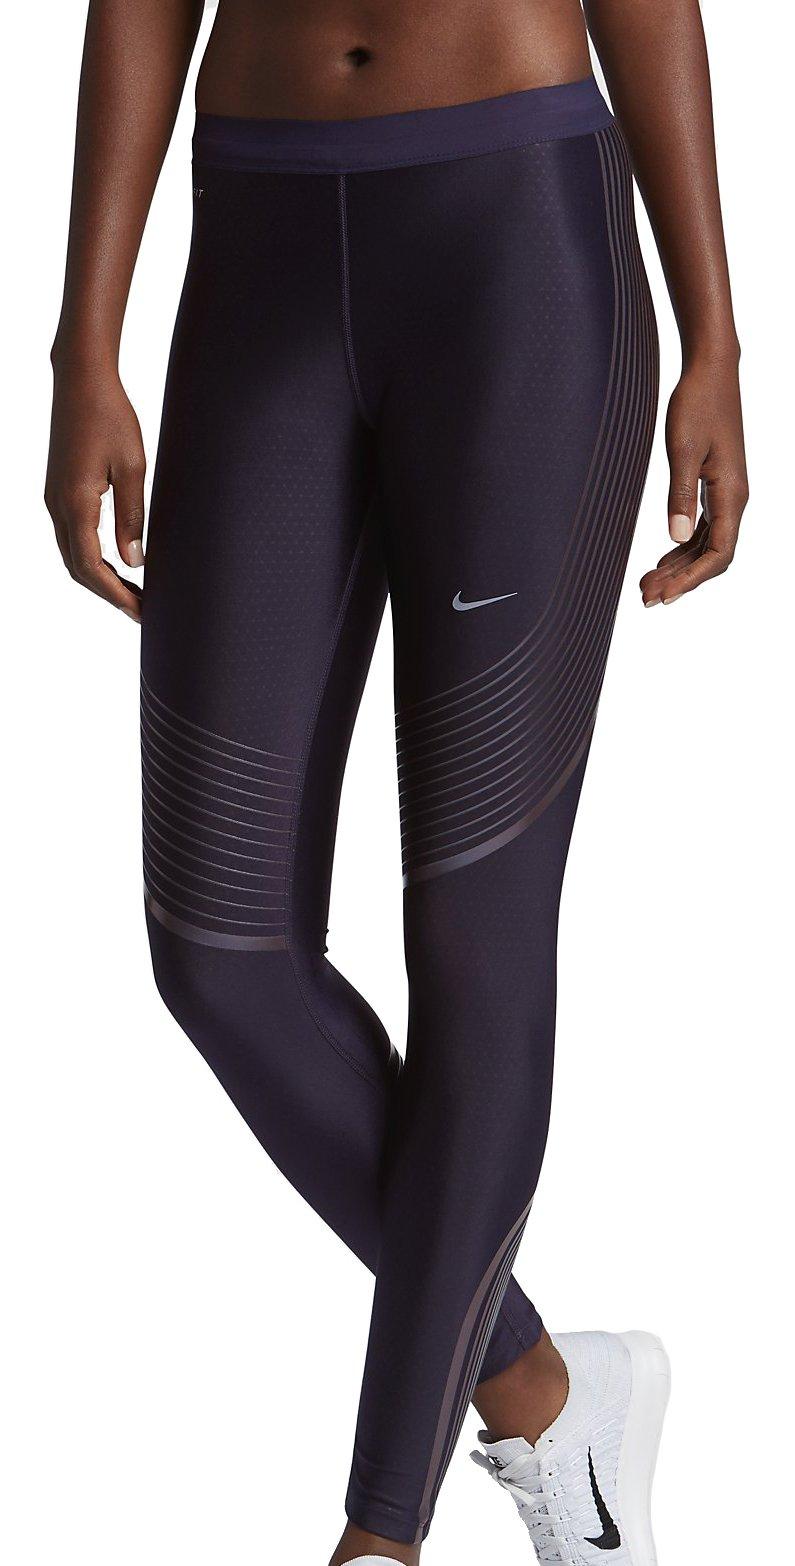 Běžecké legíny Nike Power Speed Tight